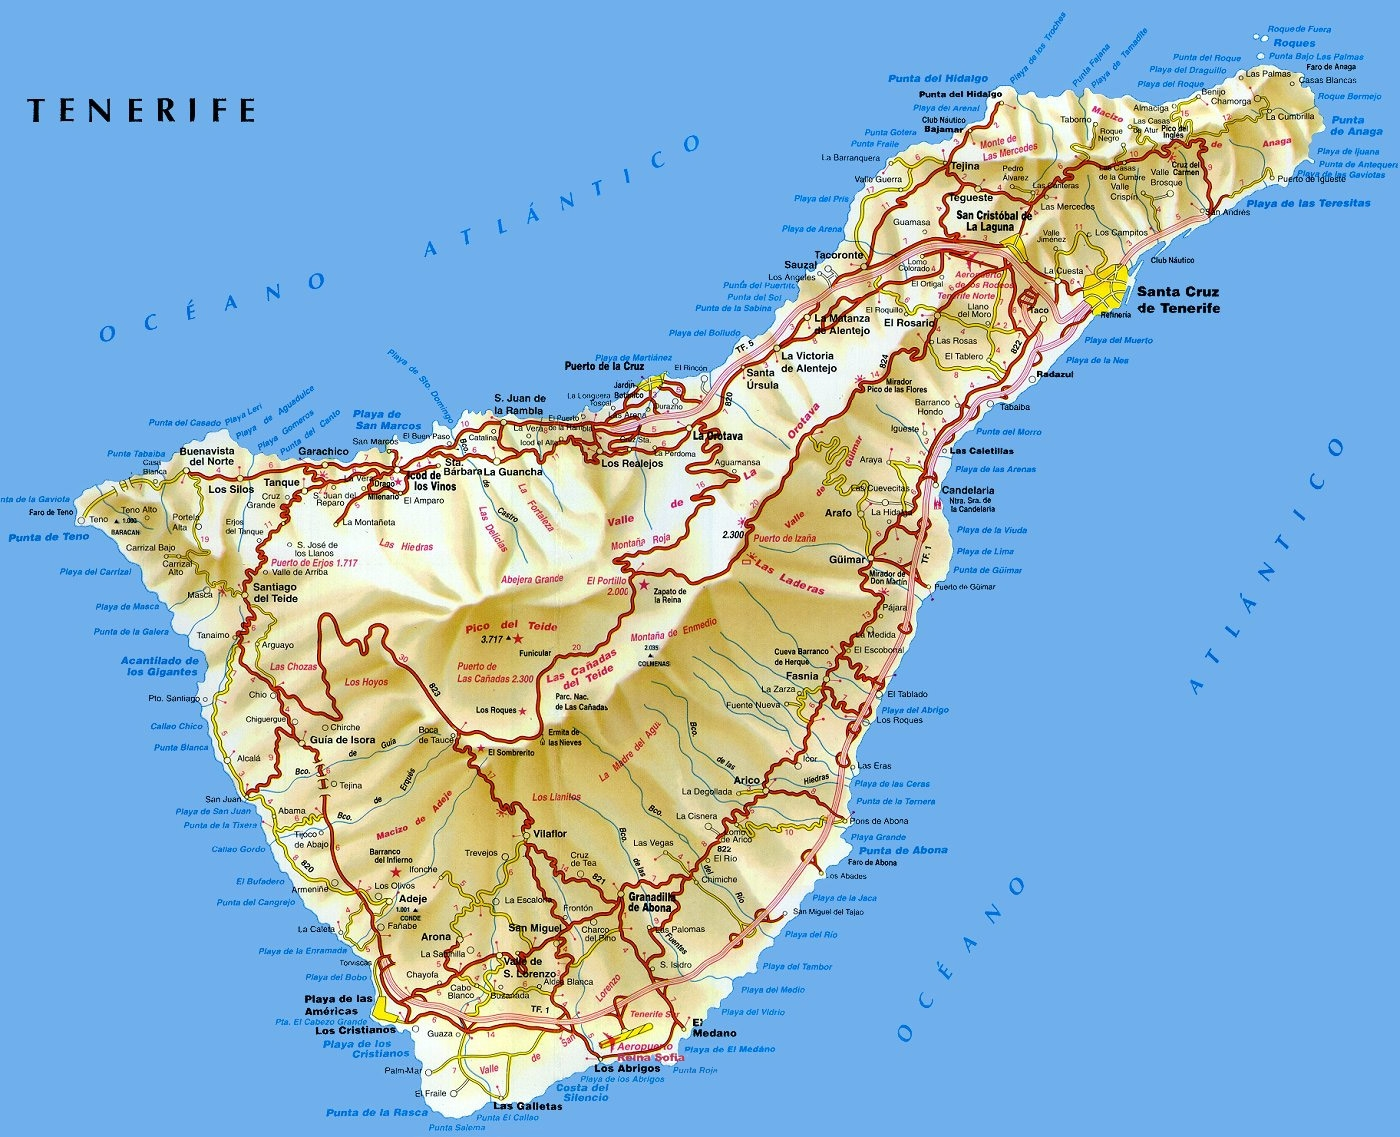 tenerife mapa Tenerife Map   Tenerife Island Maps   Map of Tenerife tenerife mapa